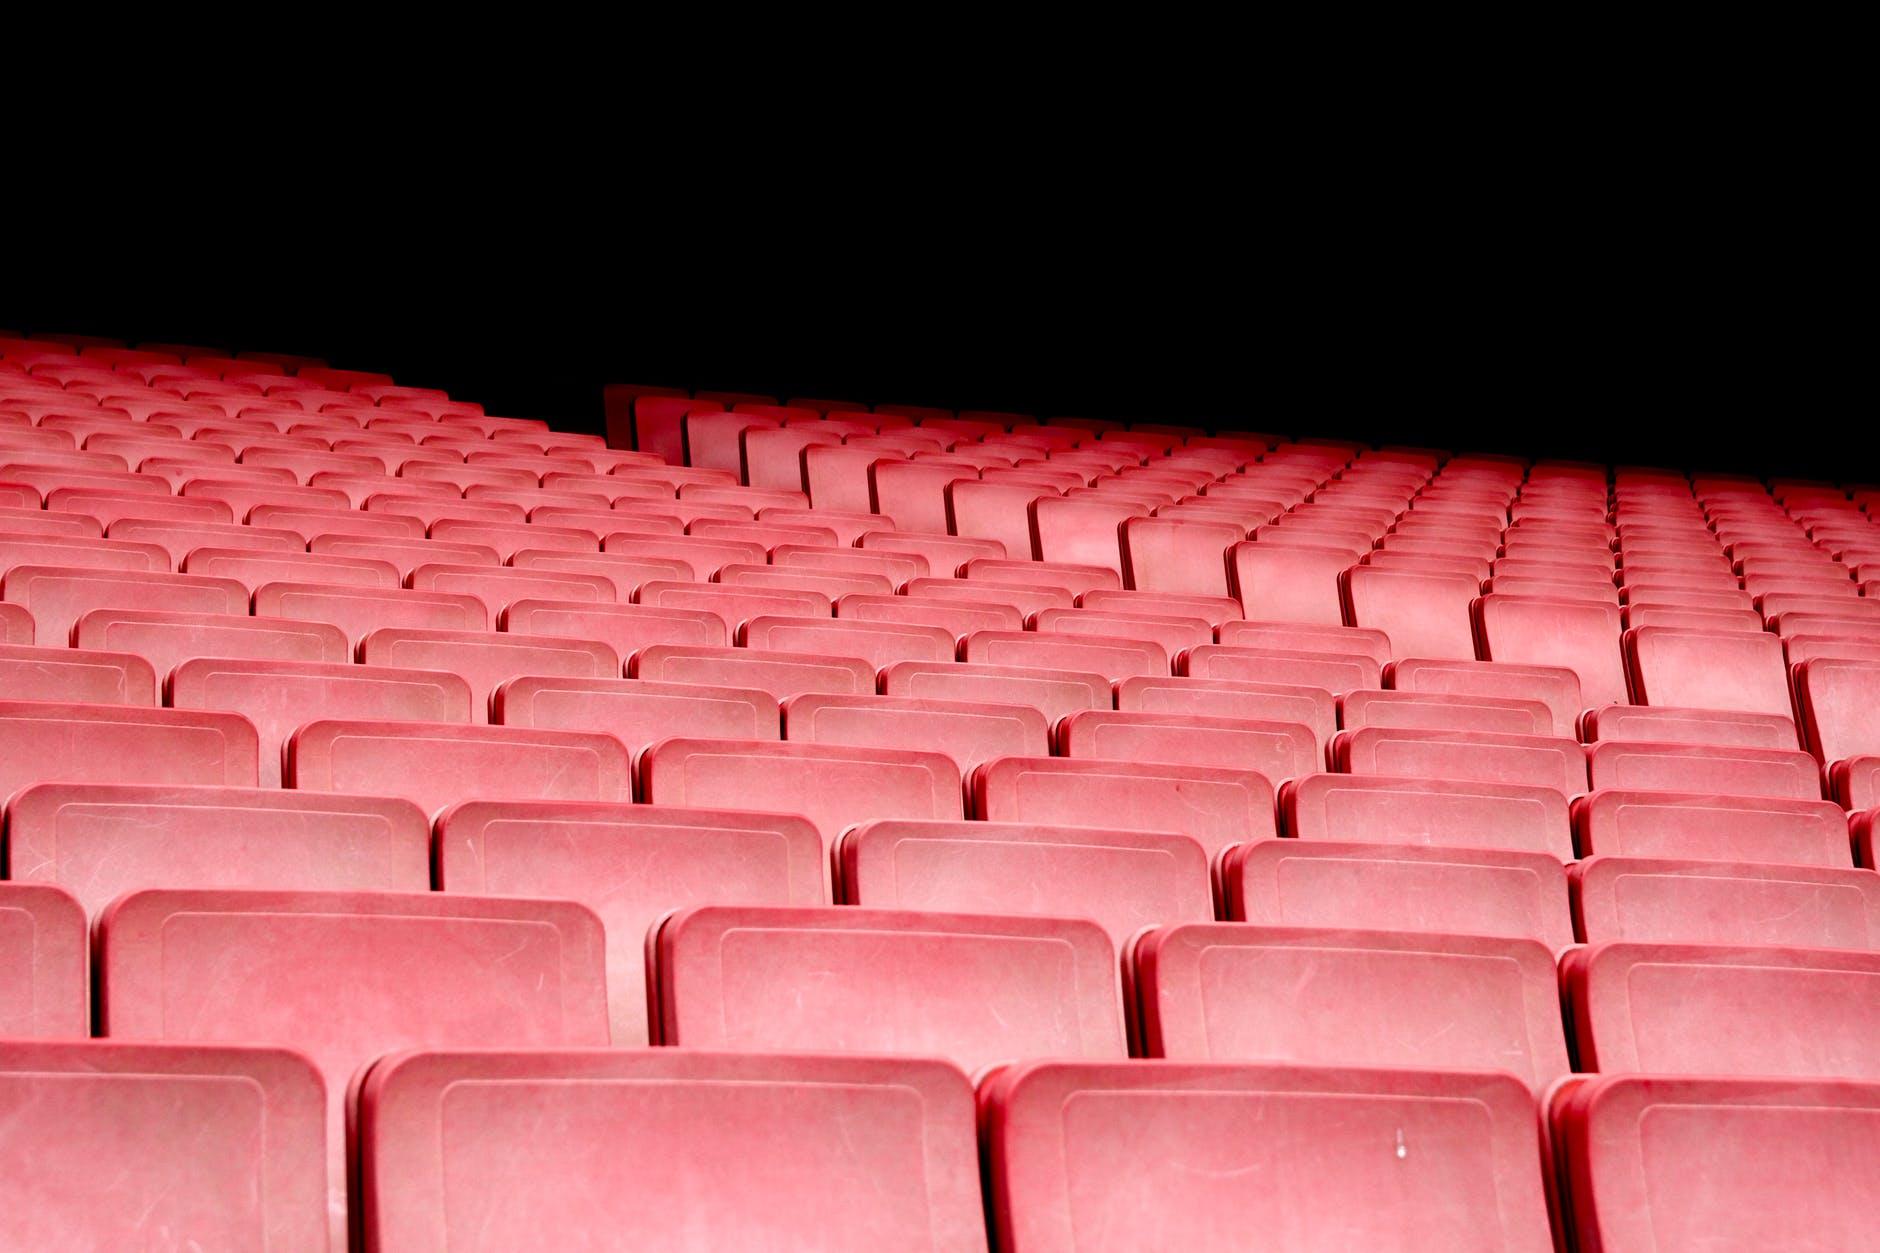 audience auditorium bleachers chairs